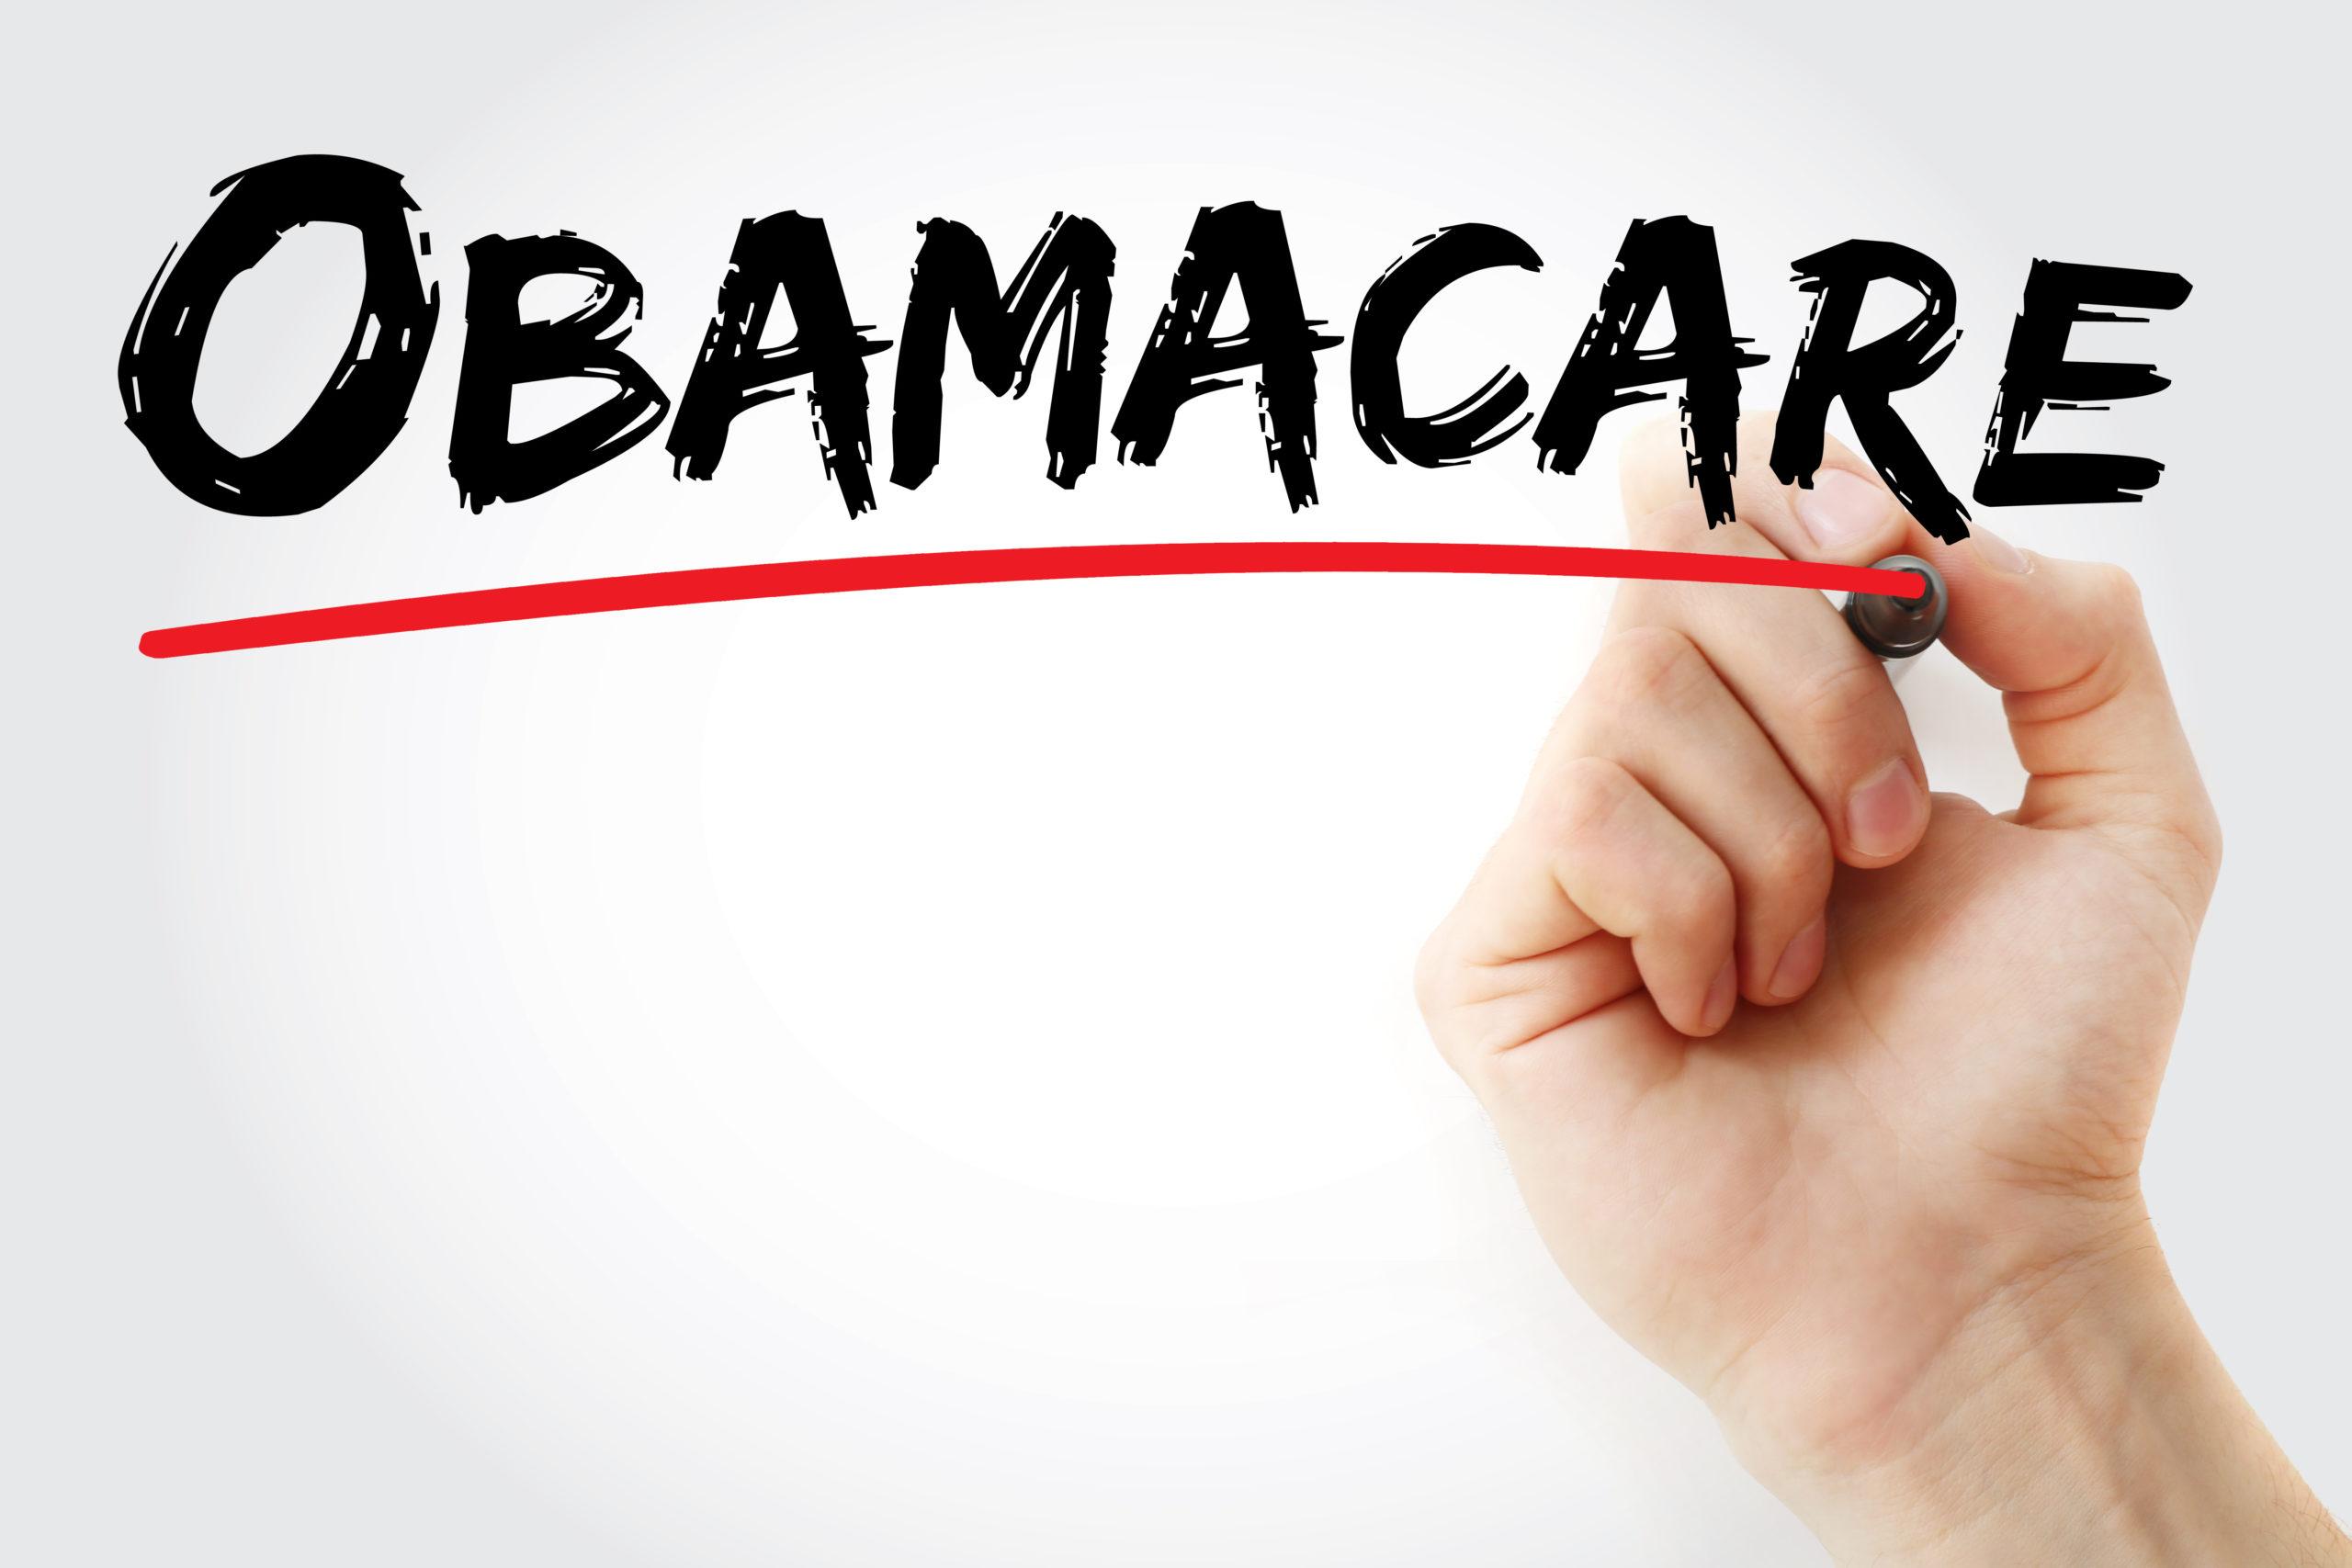 obamacare substance abuse